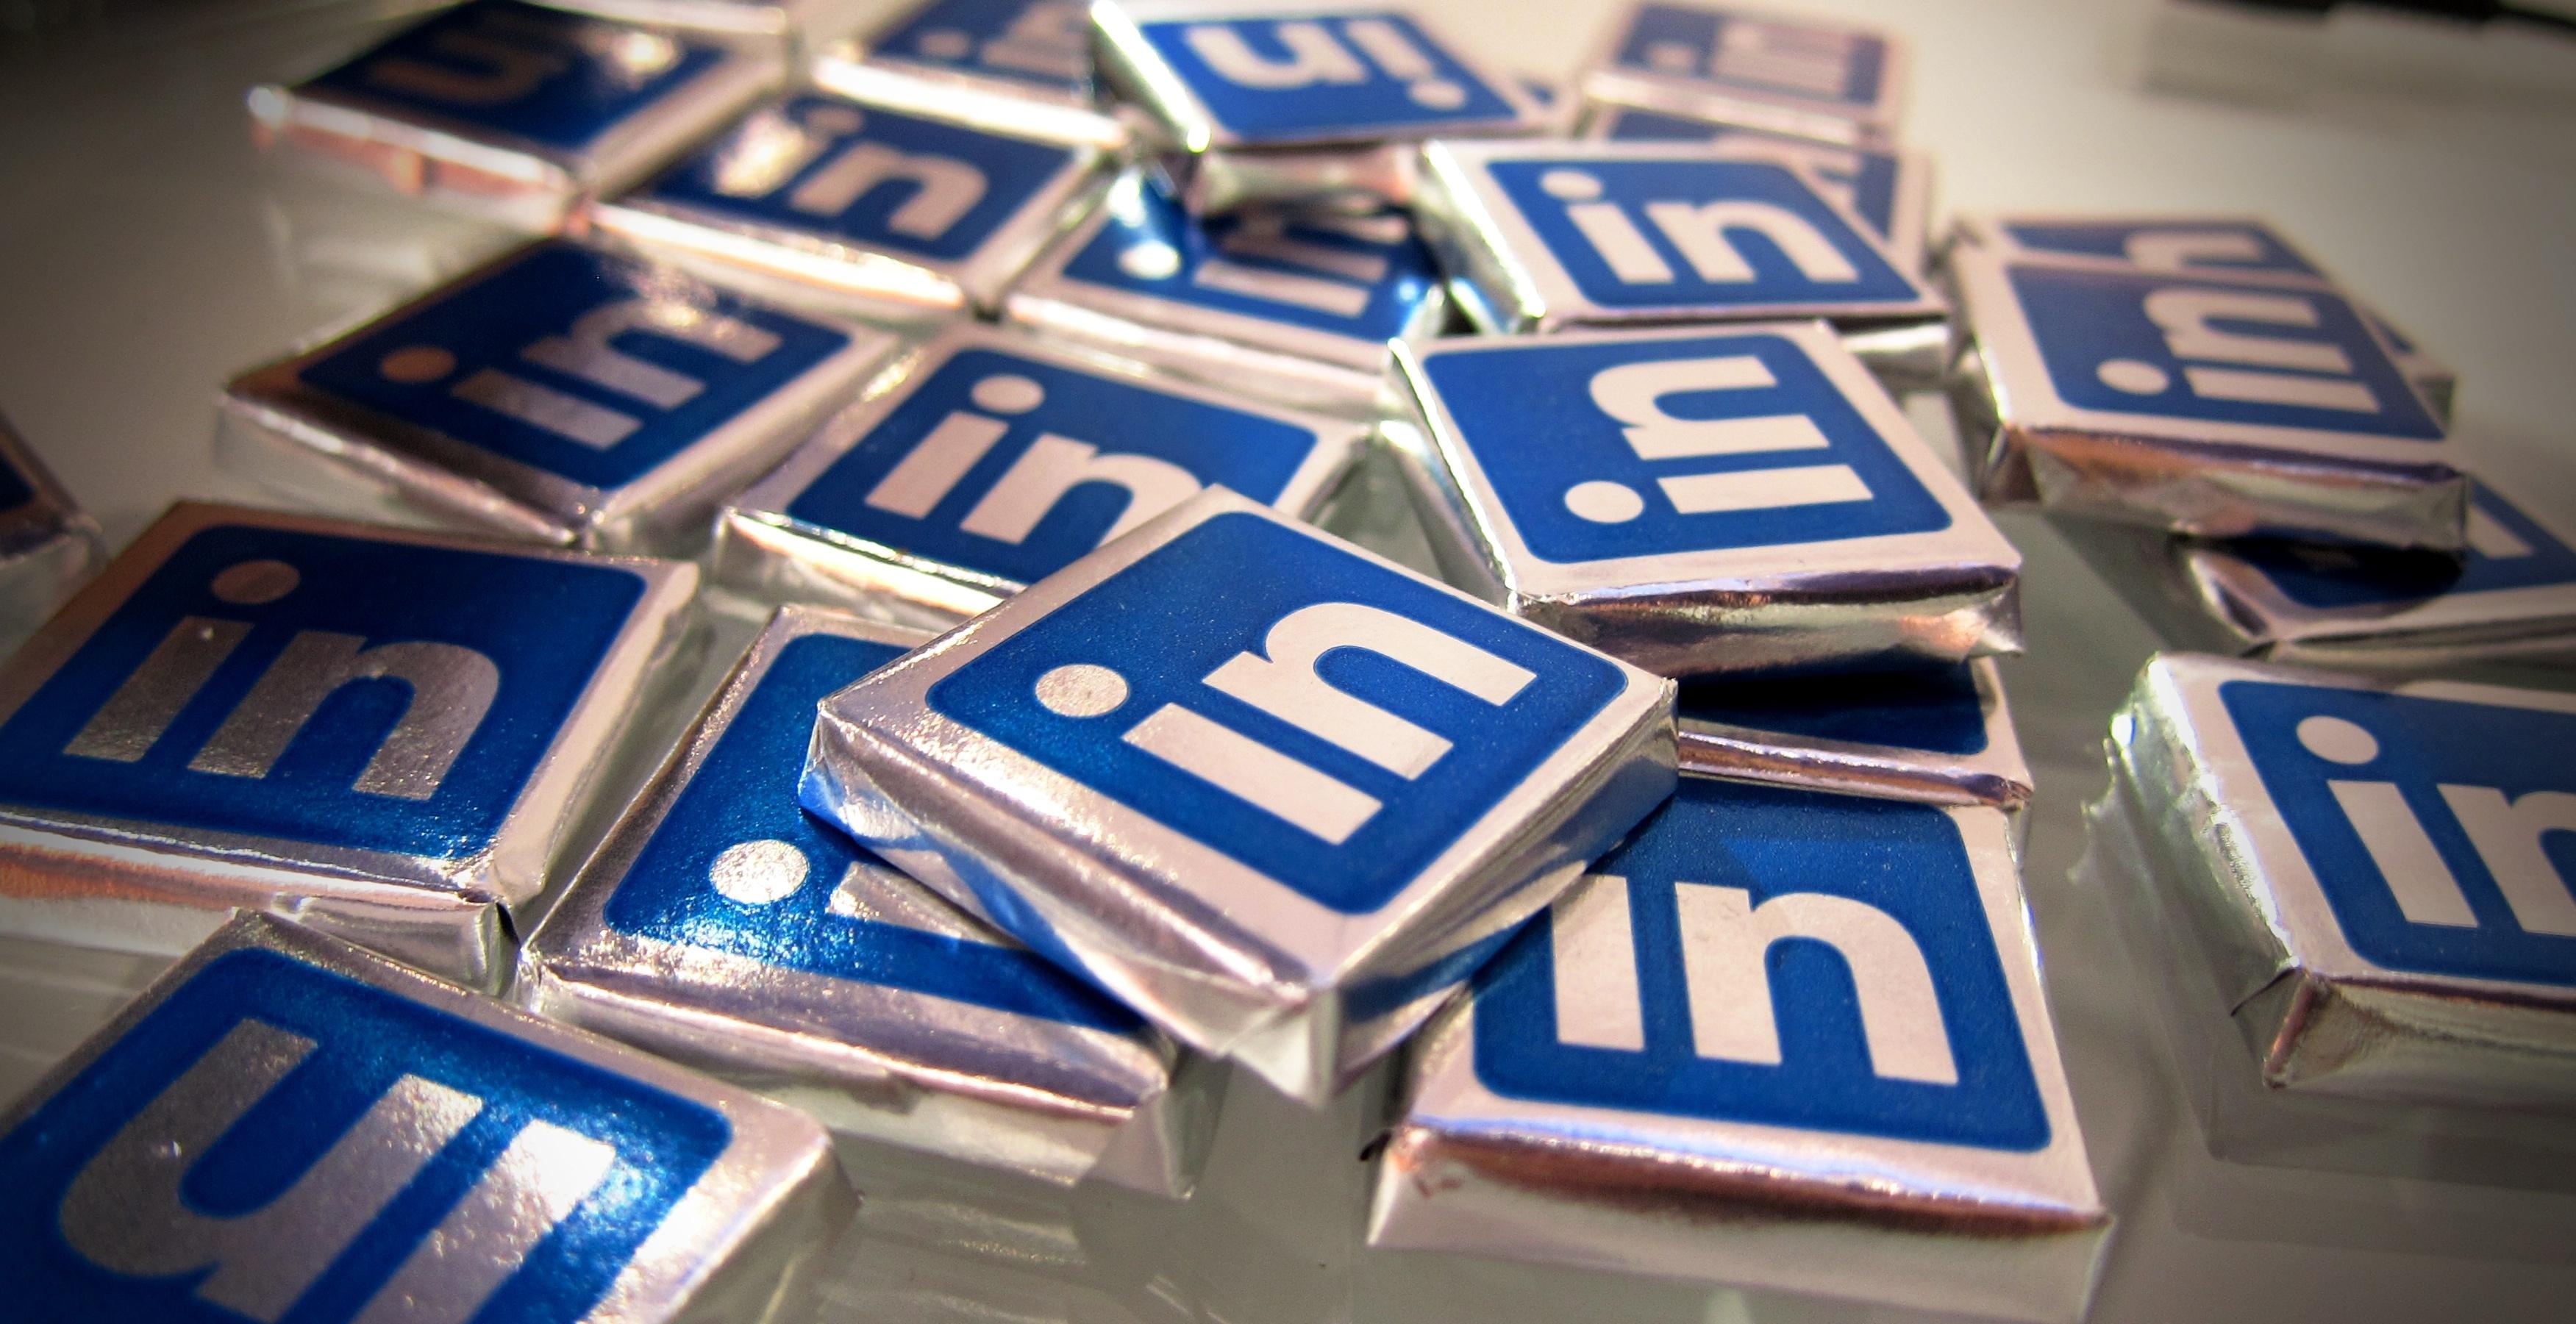 Linkedin_Chocolates_successful_manufacturing_linkedin_company_page.jpg